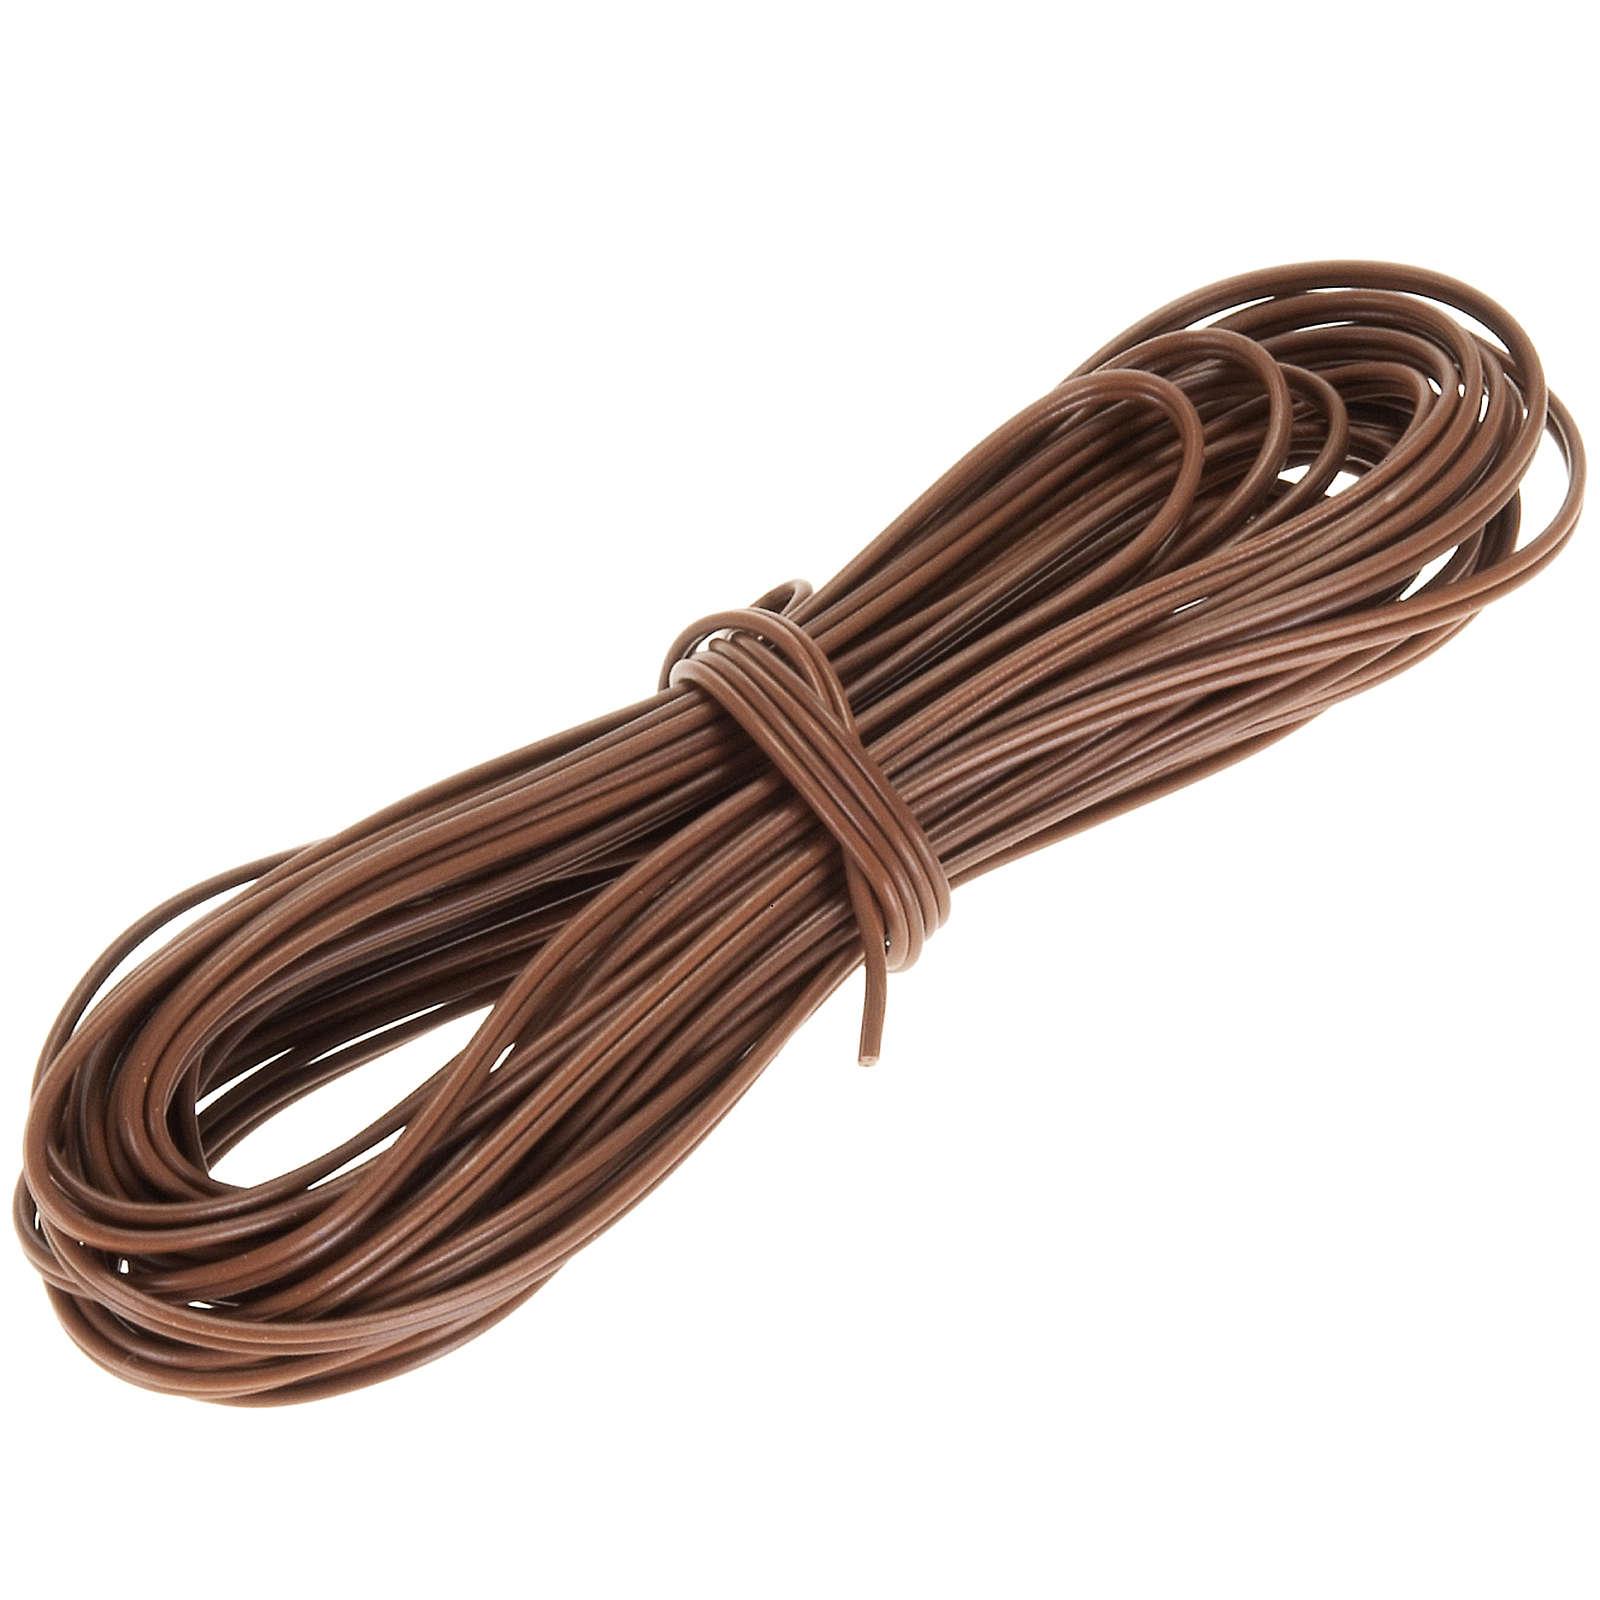 Nativity accessory, 5mt brown electric wire 4